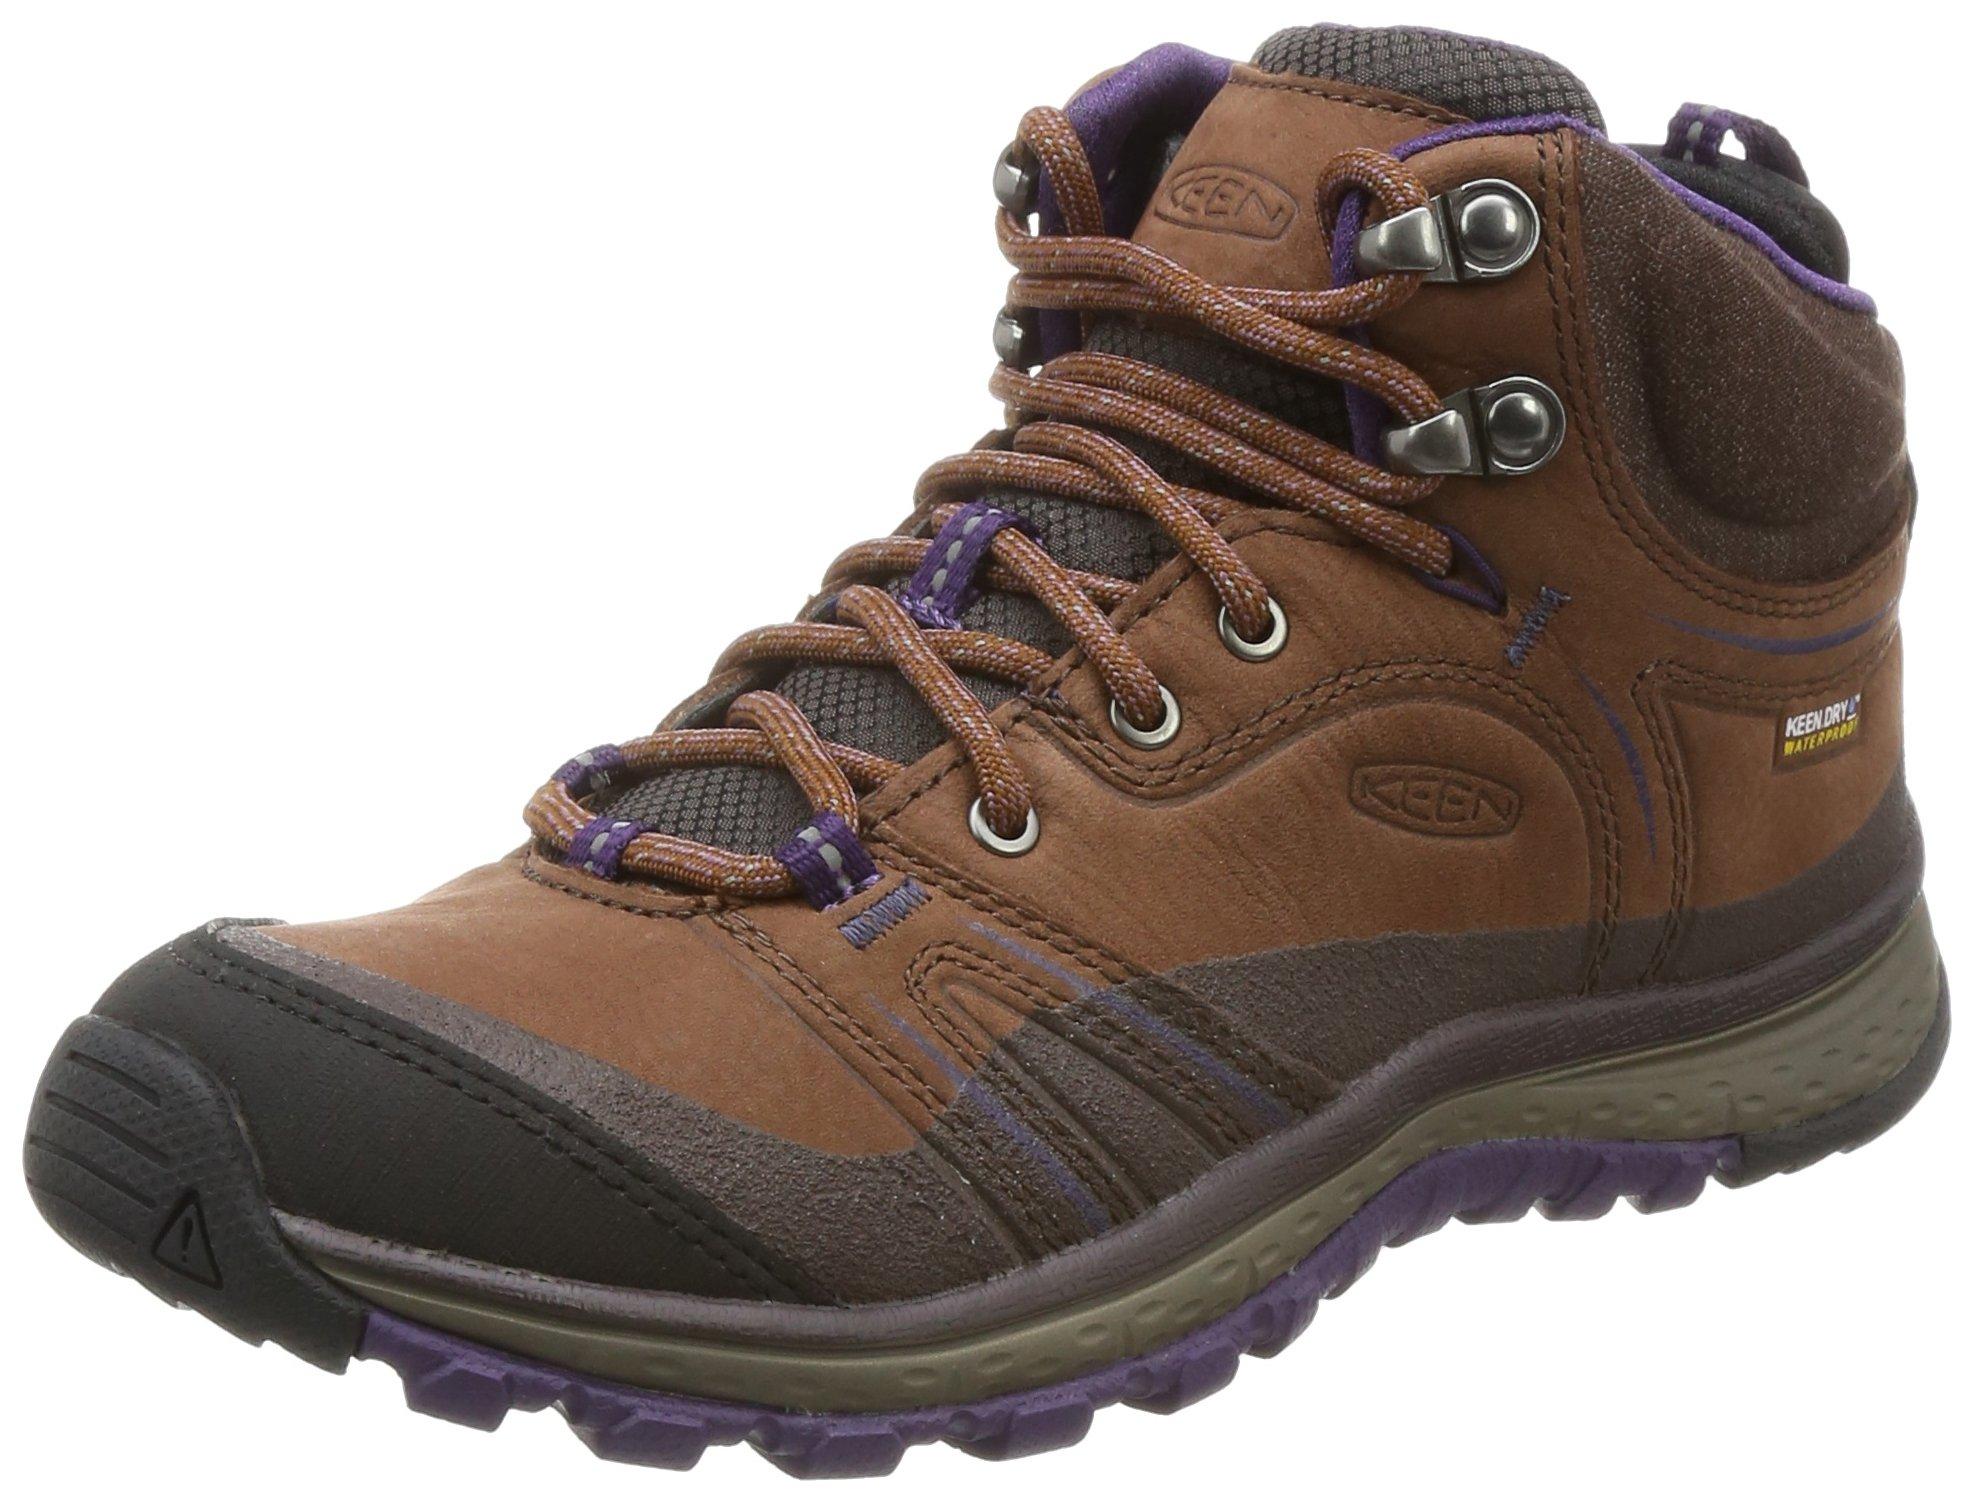 KEEN Women's Terradora Leather Mid WP-w Hiking Shoe, Scotch/Mulch, 7.5 M US